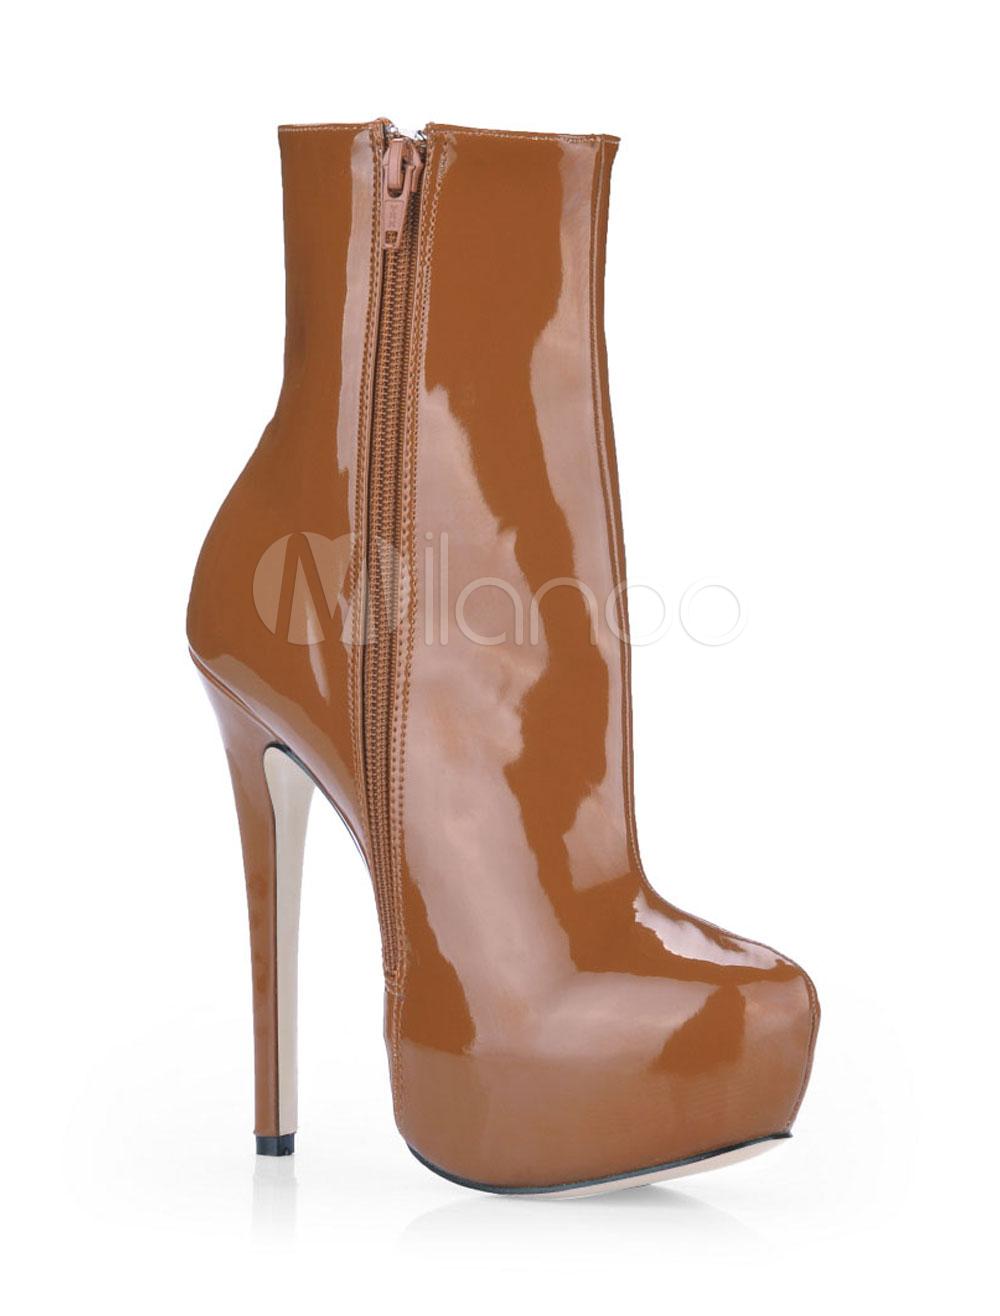 Chocolate Almond Toe Patent Woman's High Heel Booties